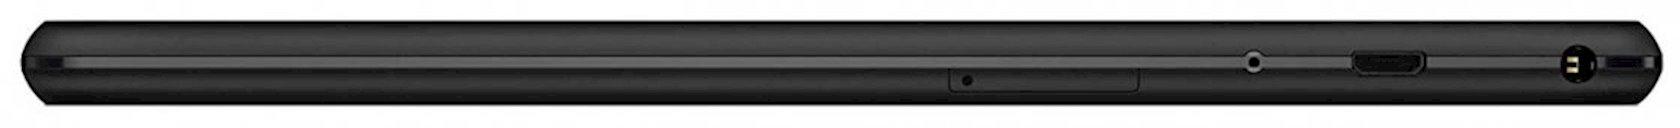 Planşet Lenovo Tab M10 TB-X505F